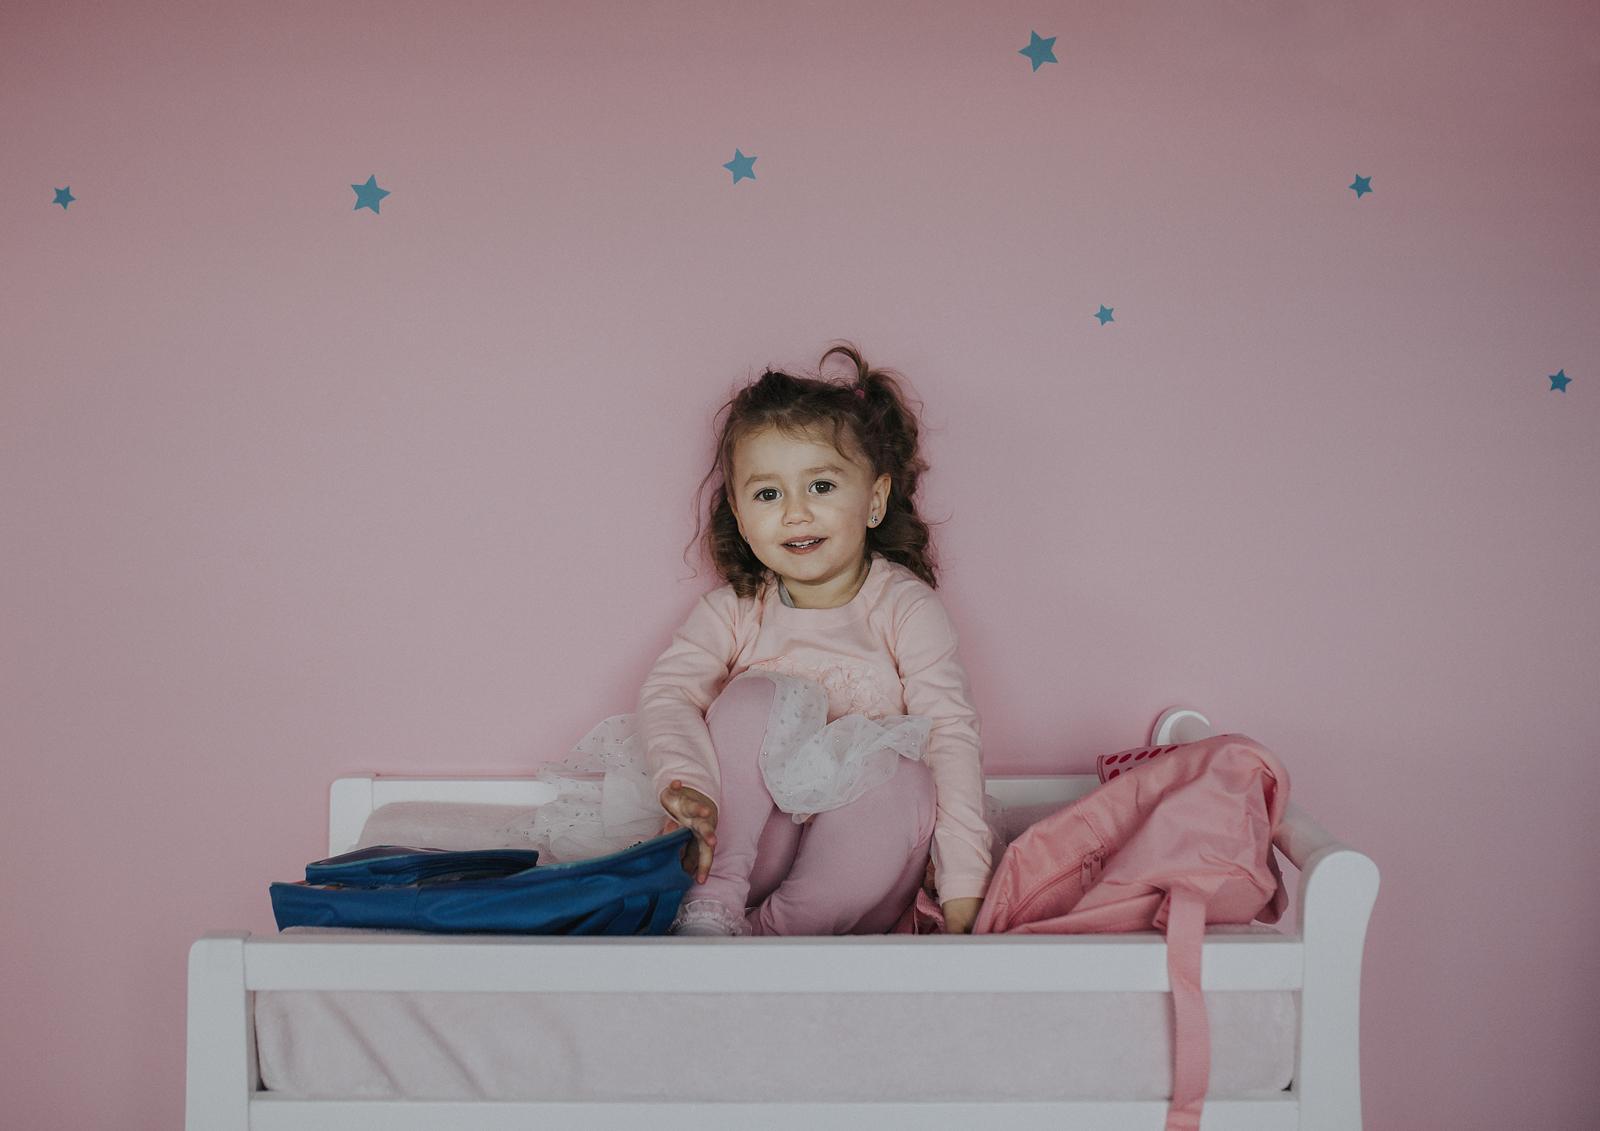 Natural Children's Photography Melbourne